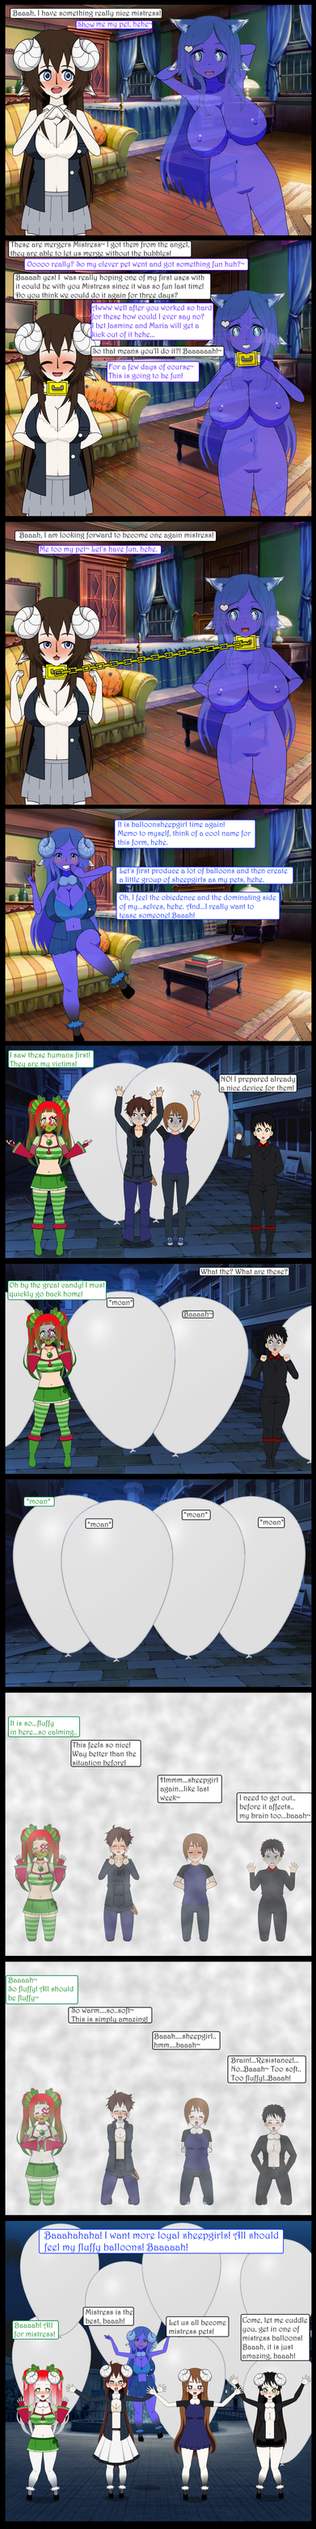 Return of Balloonsheepgirl by AiblisTheBig